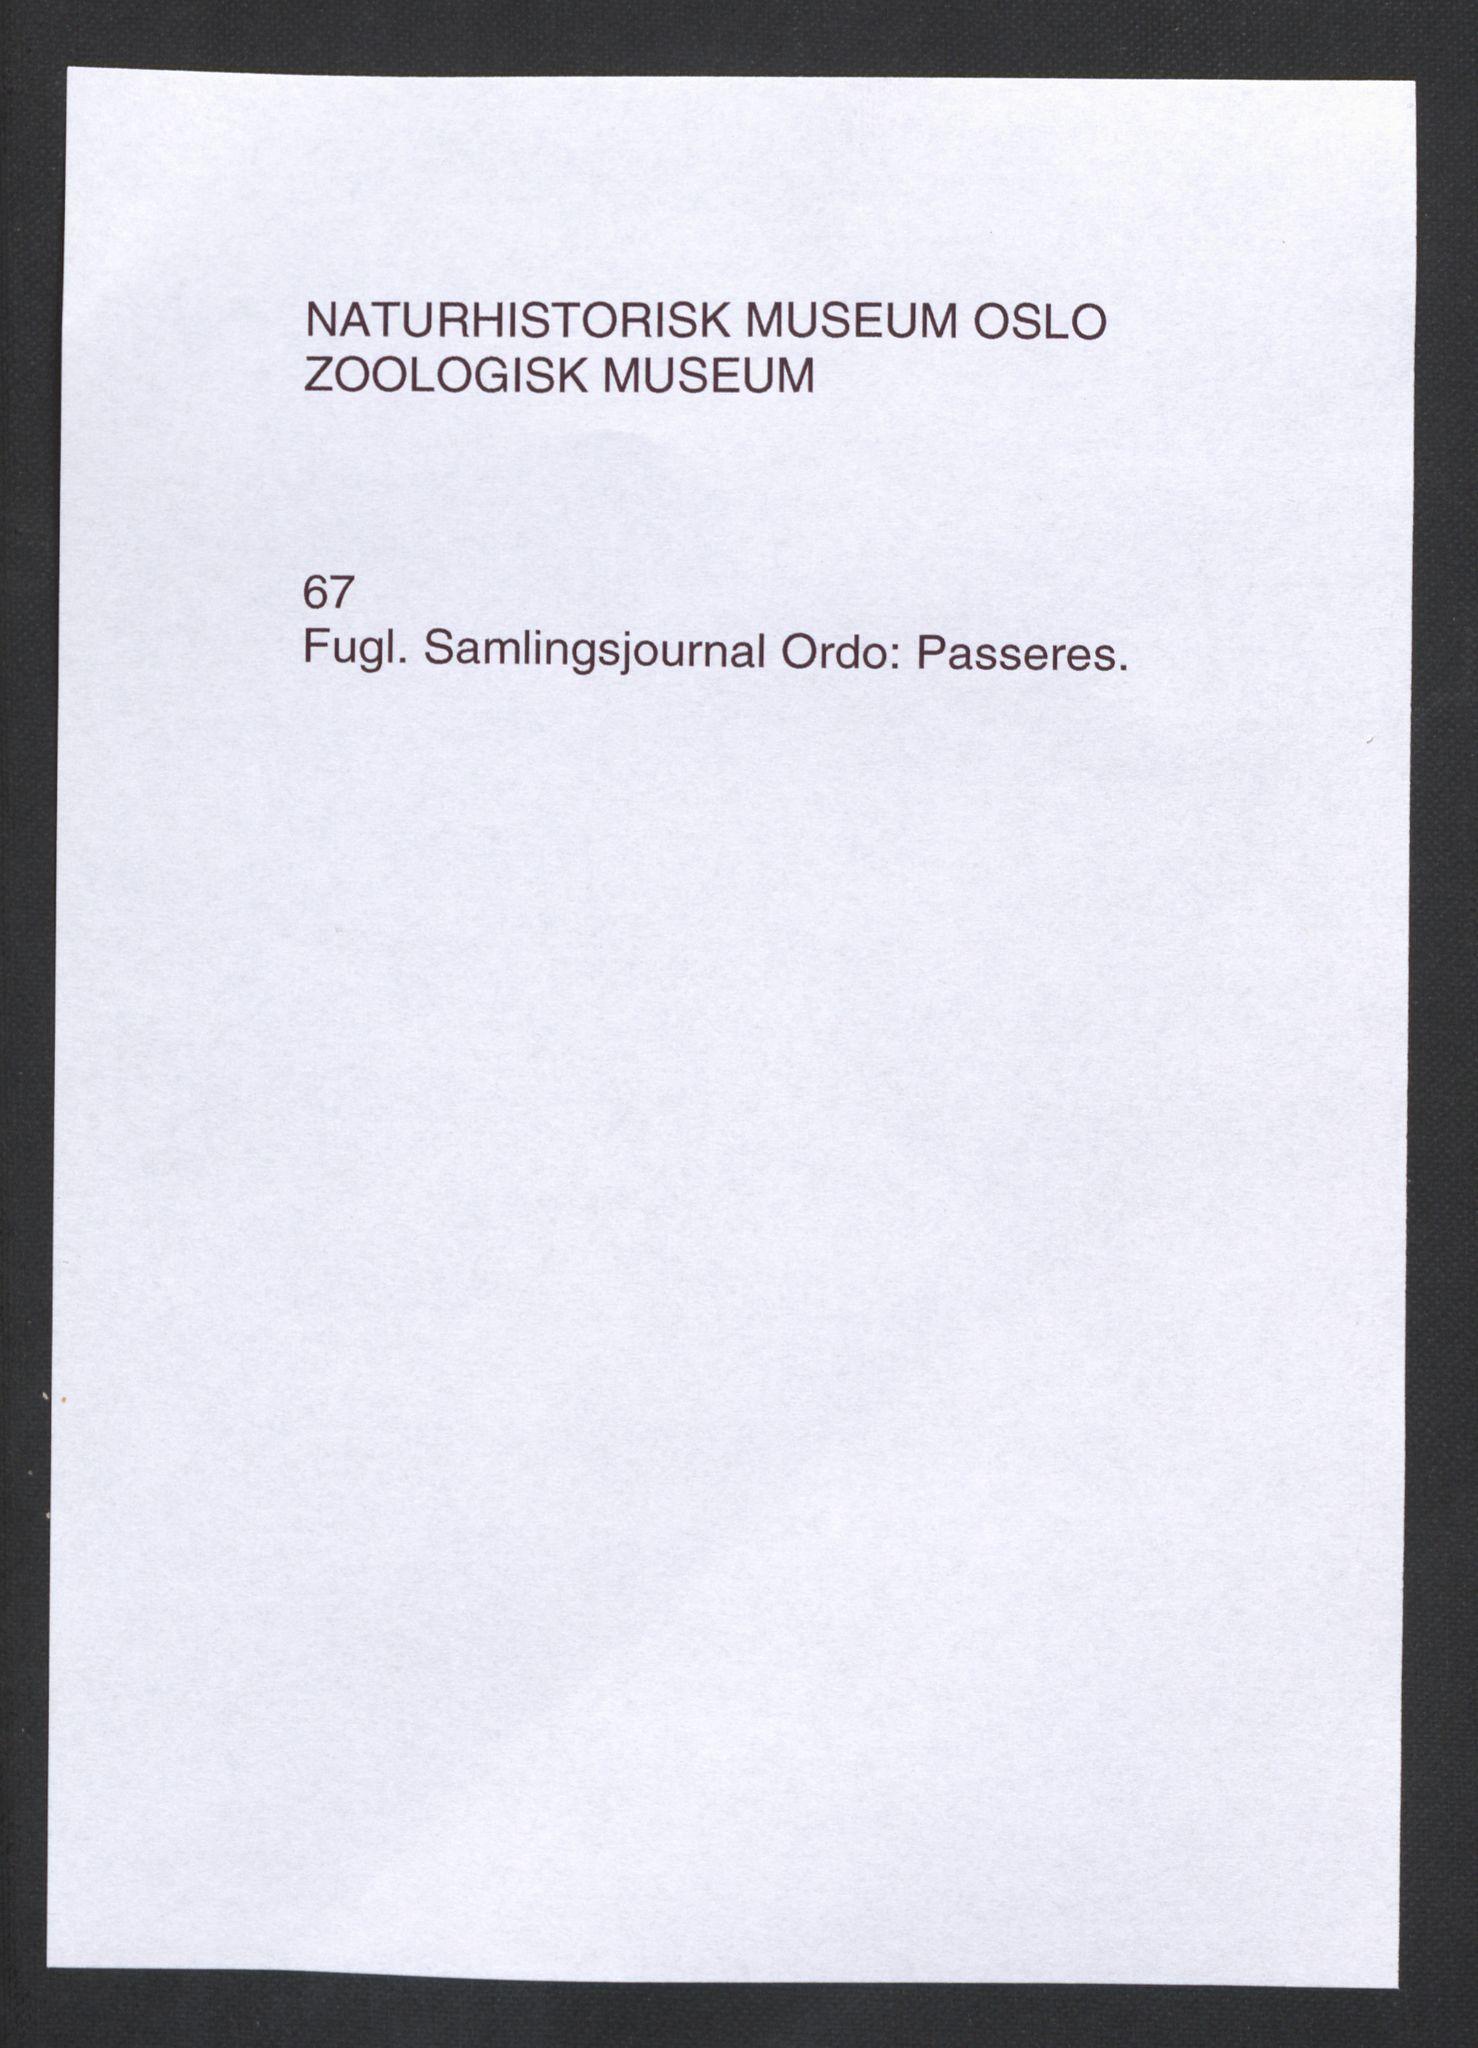 NHMO, Naturhistorisk museum (Oslo), 2: Fugl. Taksonomisk journal. Ordo: Passeres